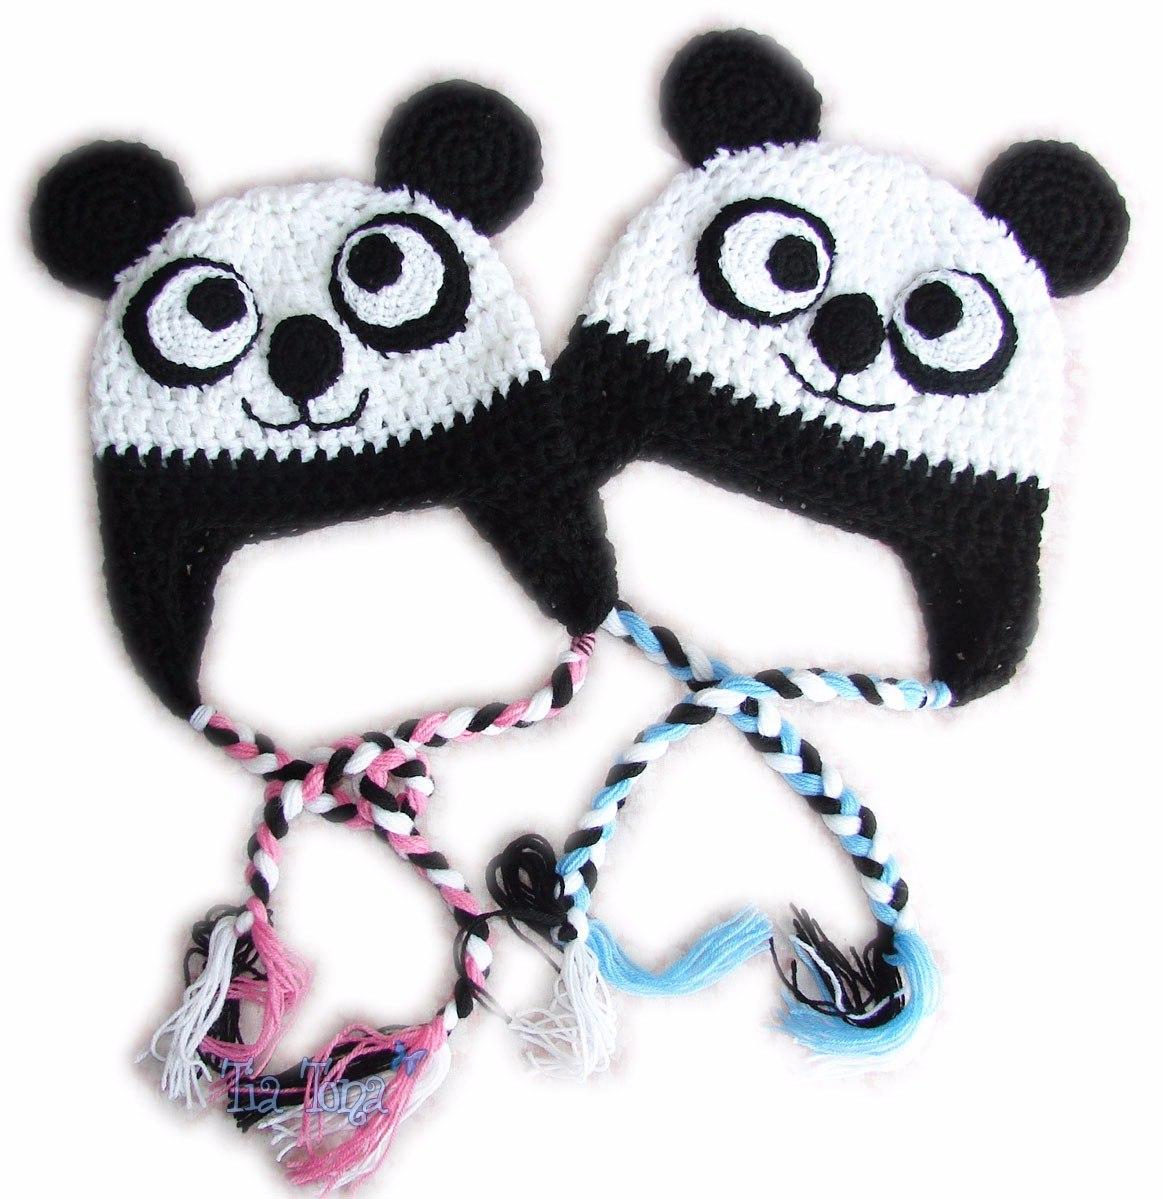 Gorros Tejidos Oso Panda Orejeras Trenzas Crochet Lana -   285 a4764174506